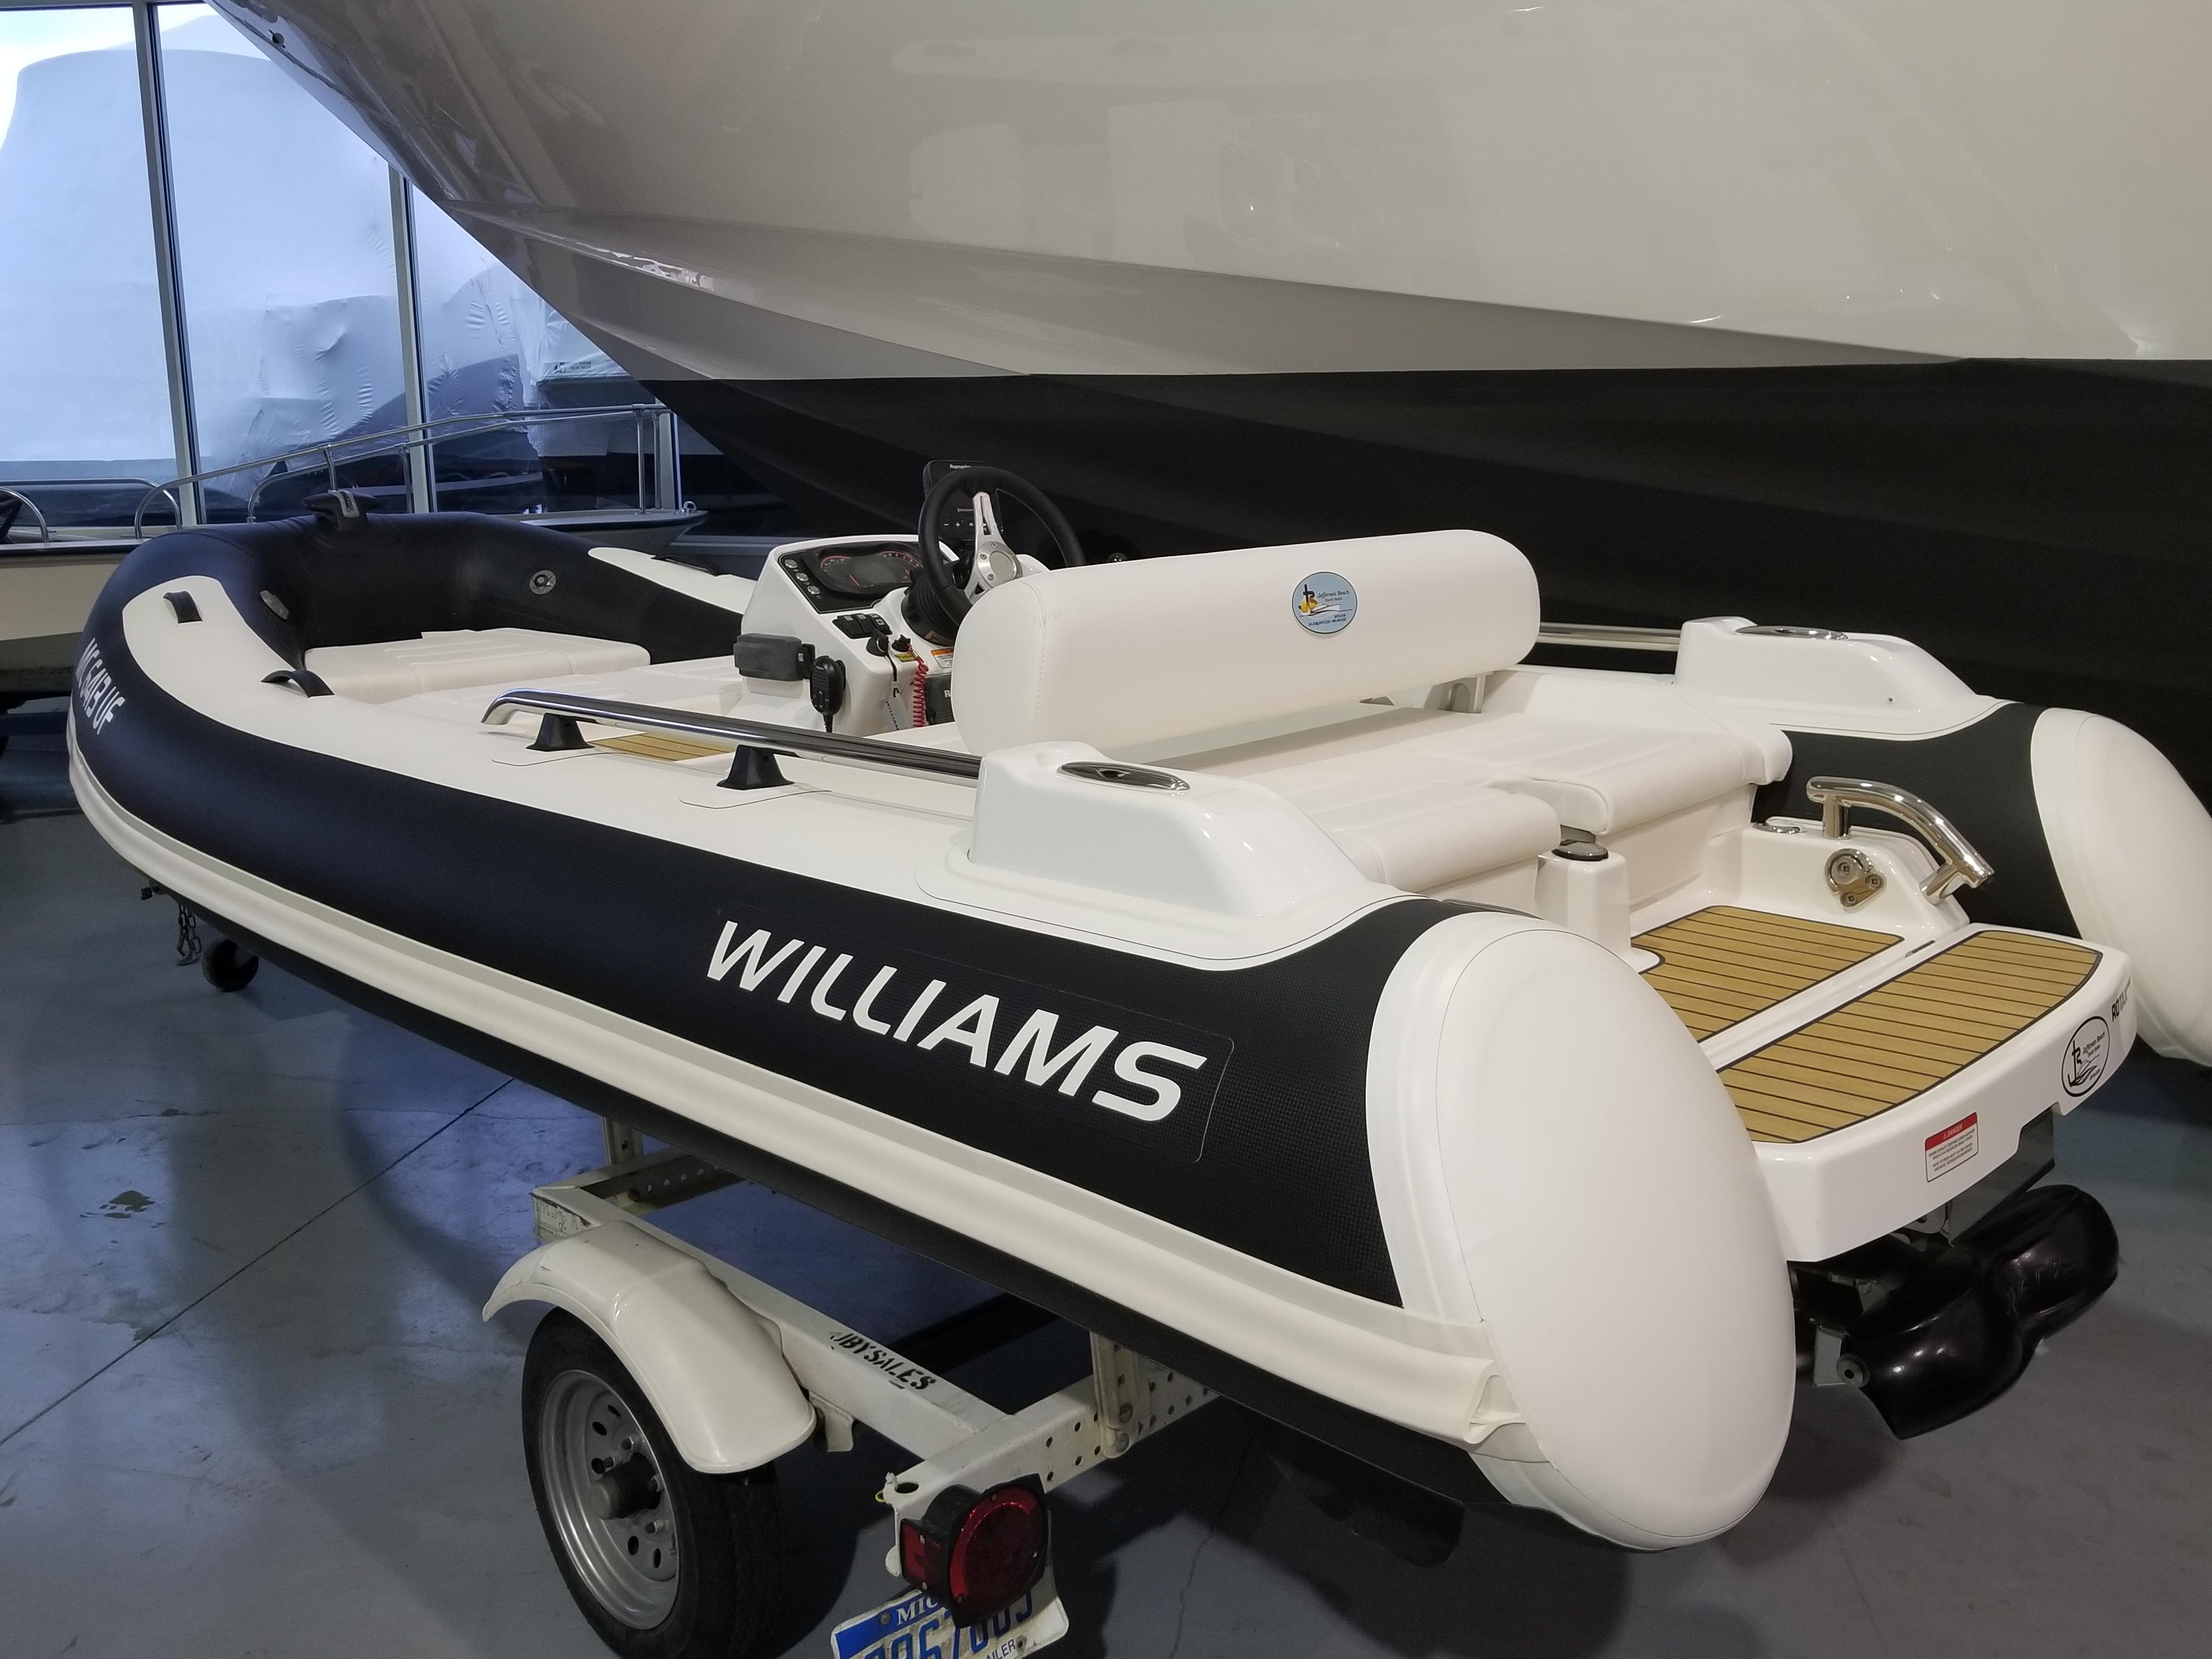 Williams Jet Tenders 395 SportJet Williams Jet Tenders 2018 395 SportJet